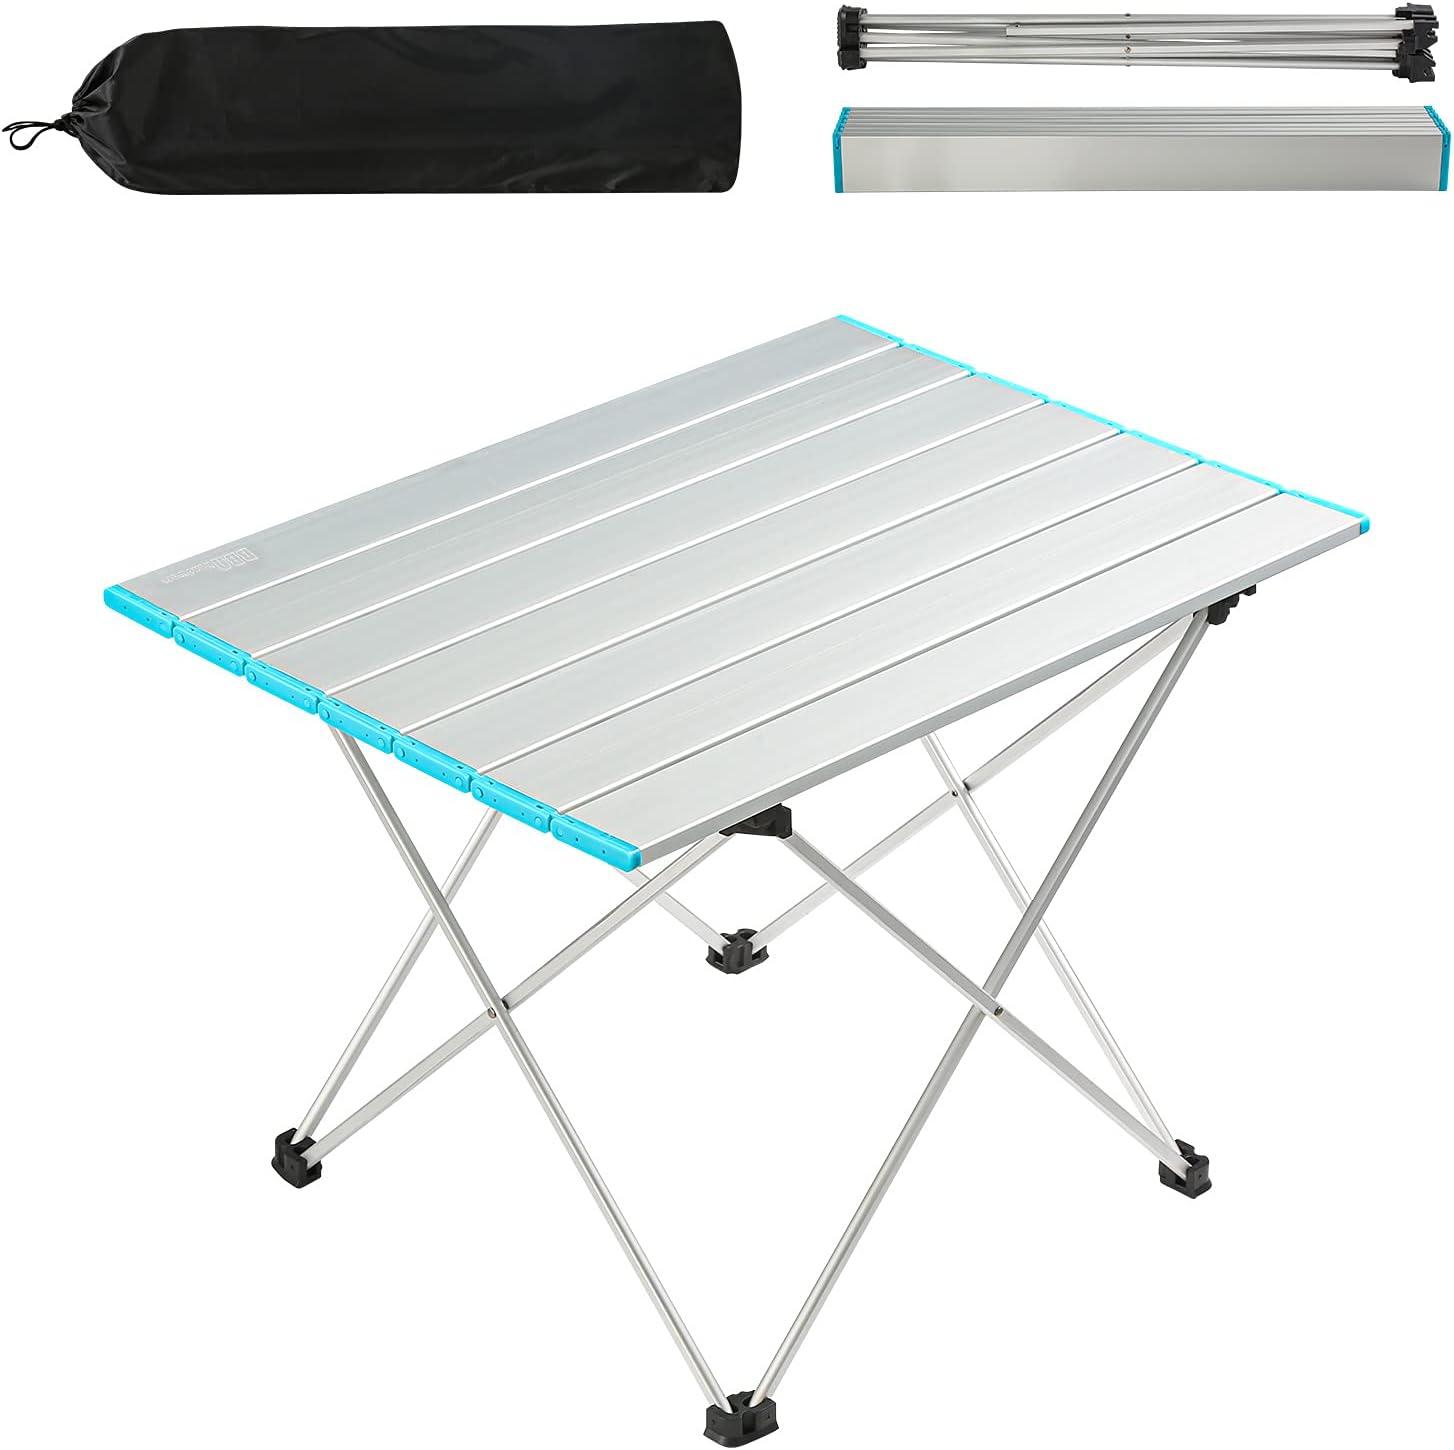 BBAhandware 22x16x16 in New York Mall Folding Table Portable Camping Industry No. 1 Ta Medium